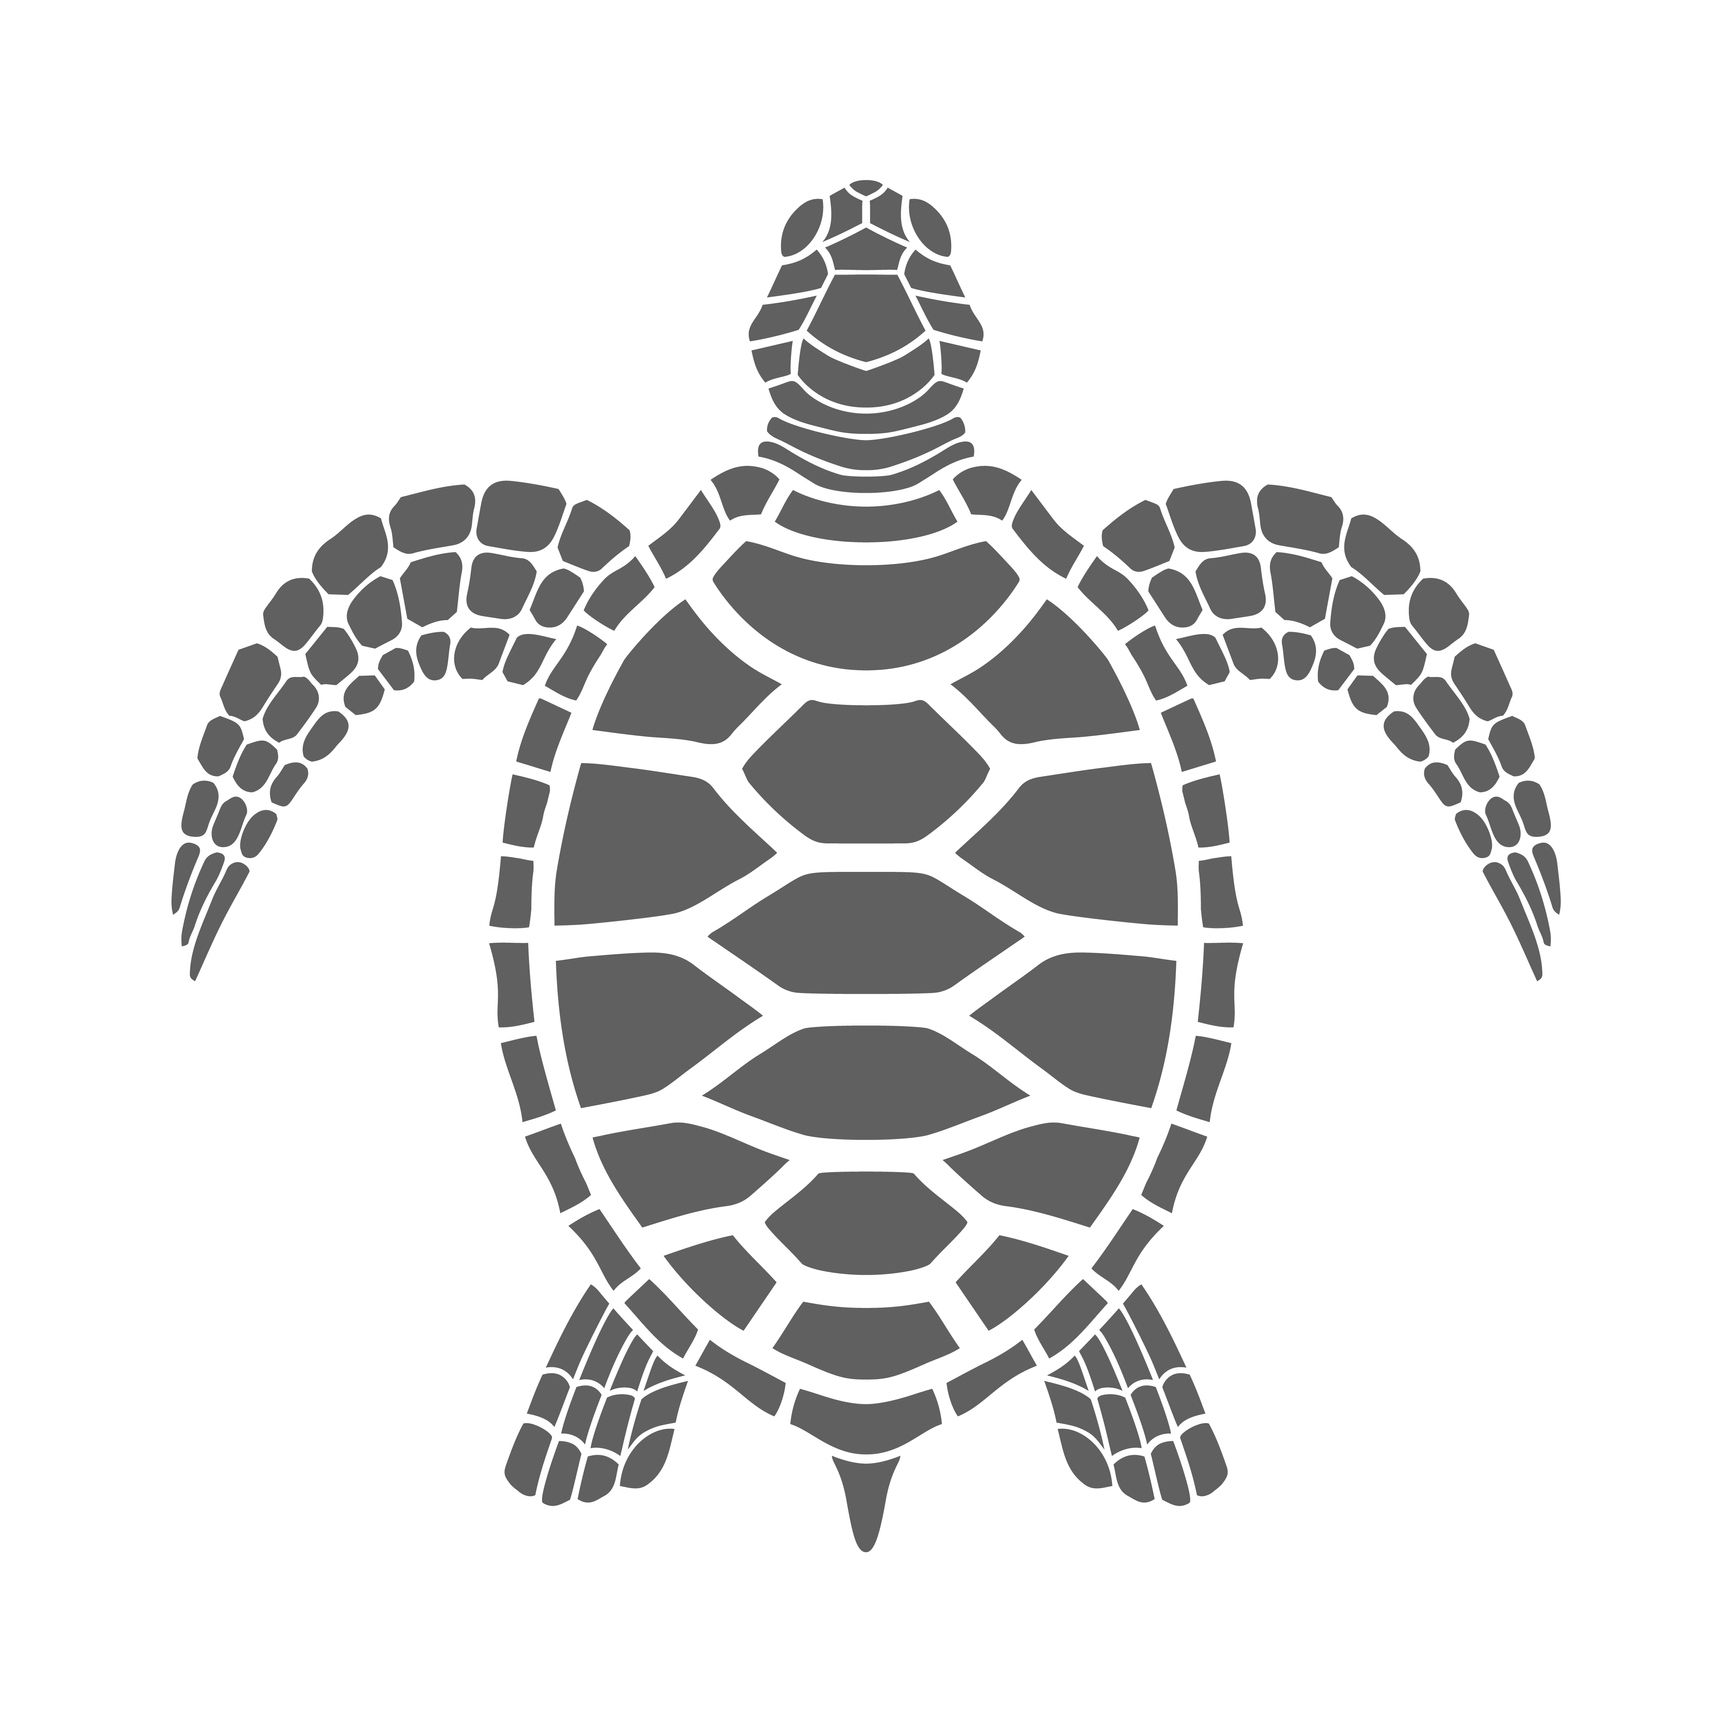 Icon sea turtle. Isolated gray symbol on white background.